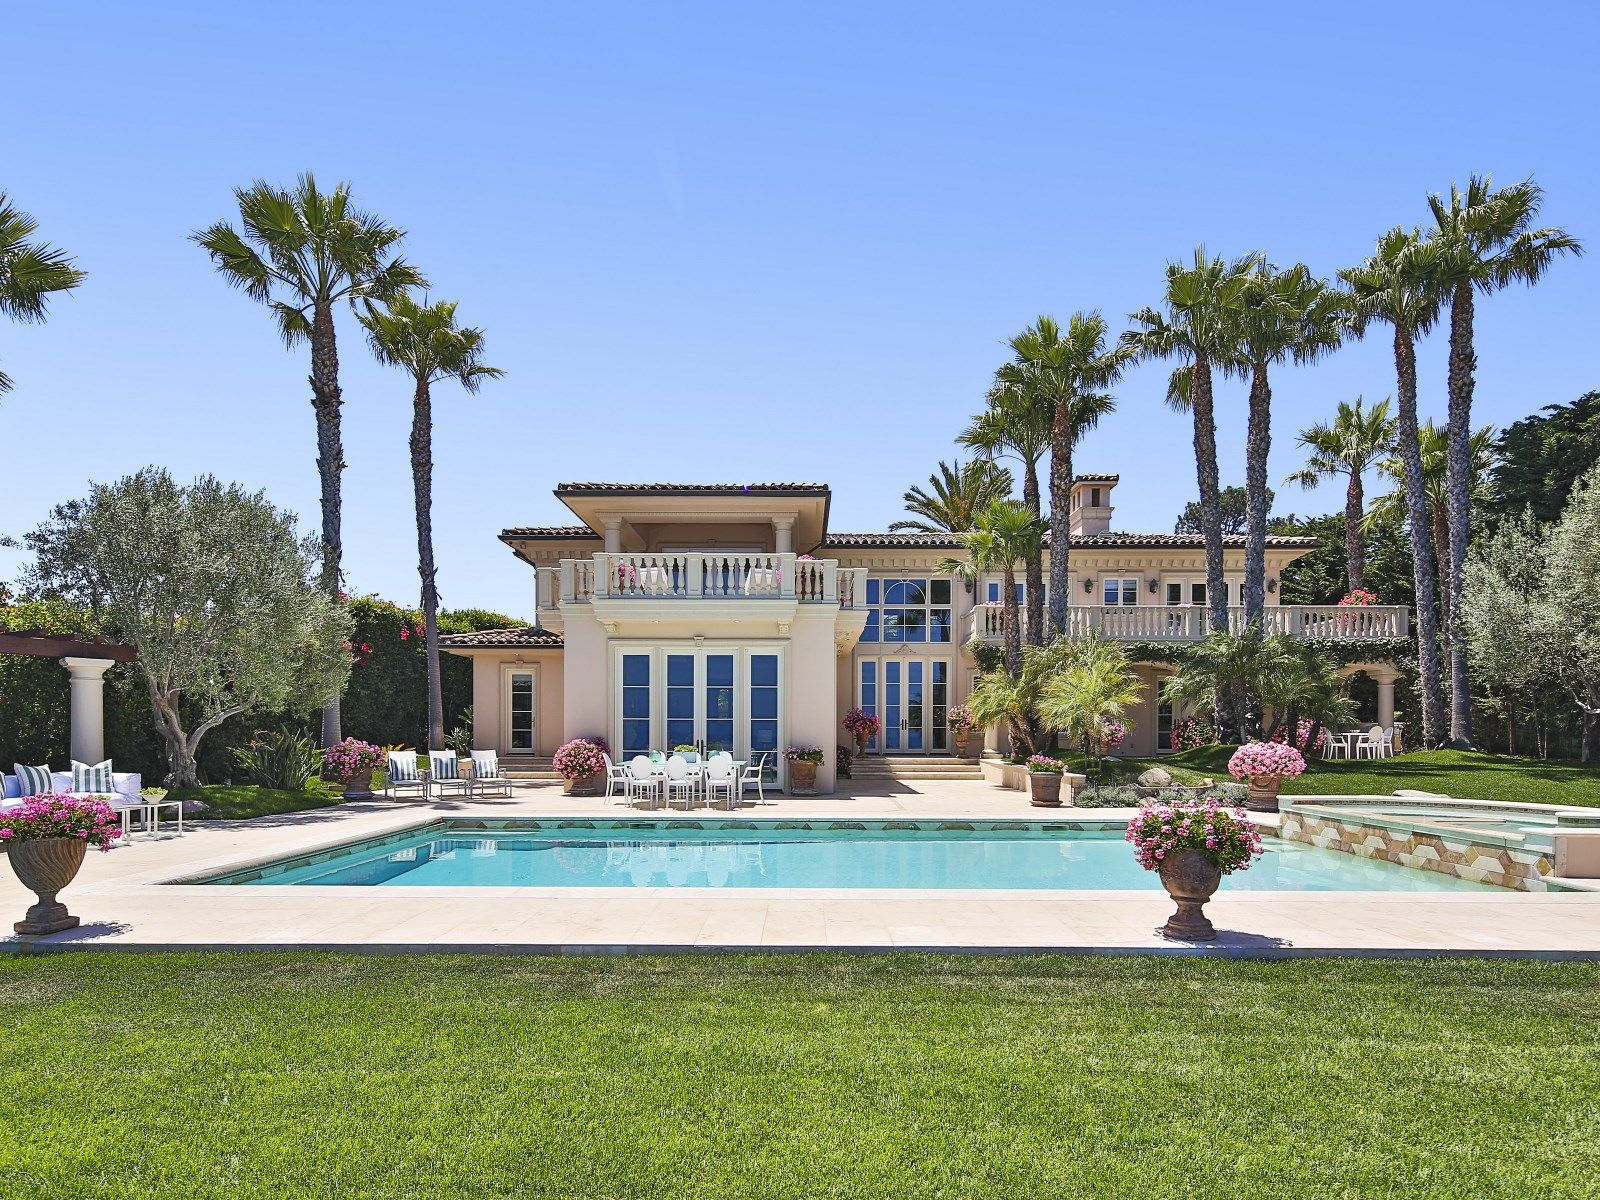 European style Villa Malibu CA Single Family Home Los Angeles